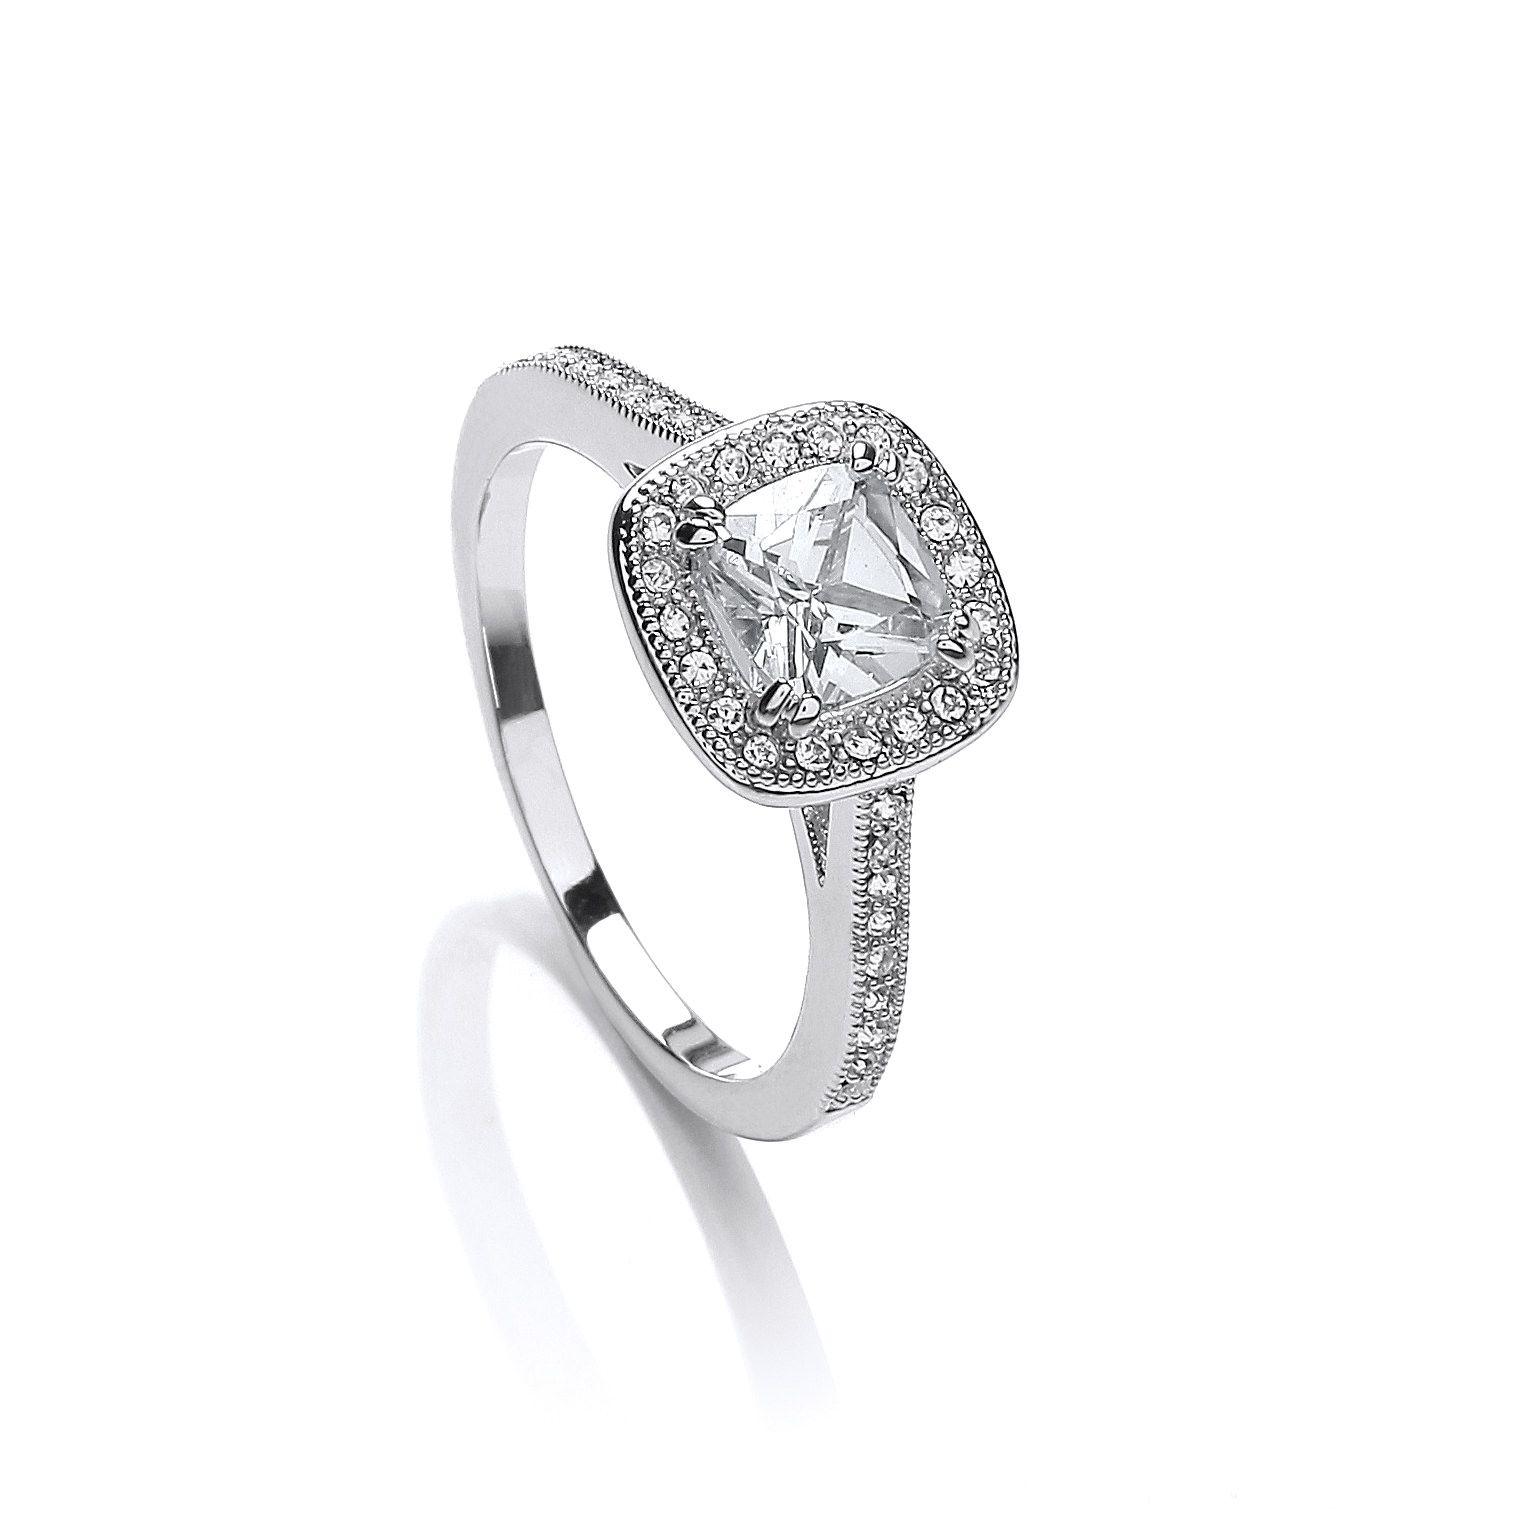 Buckley London Pippa Ring